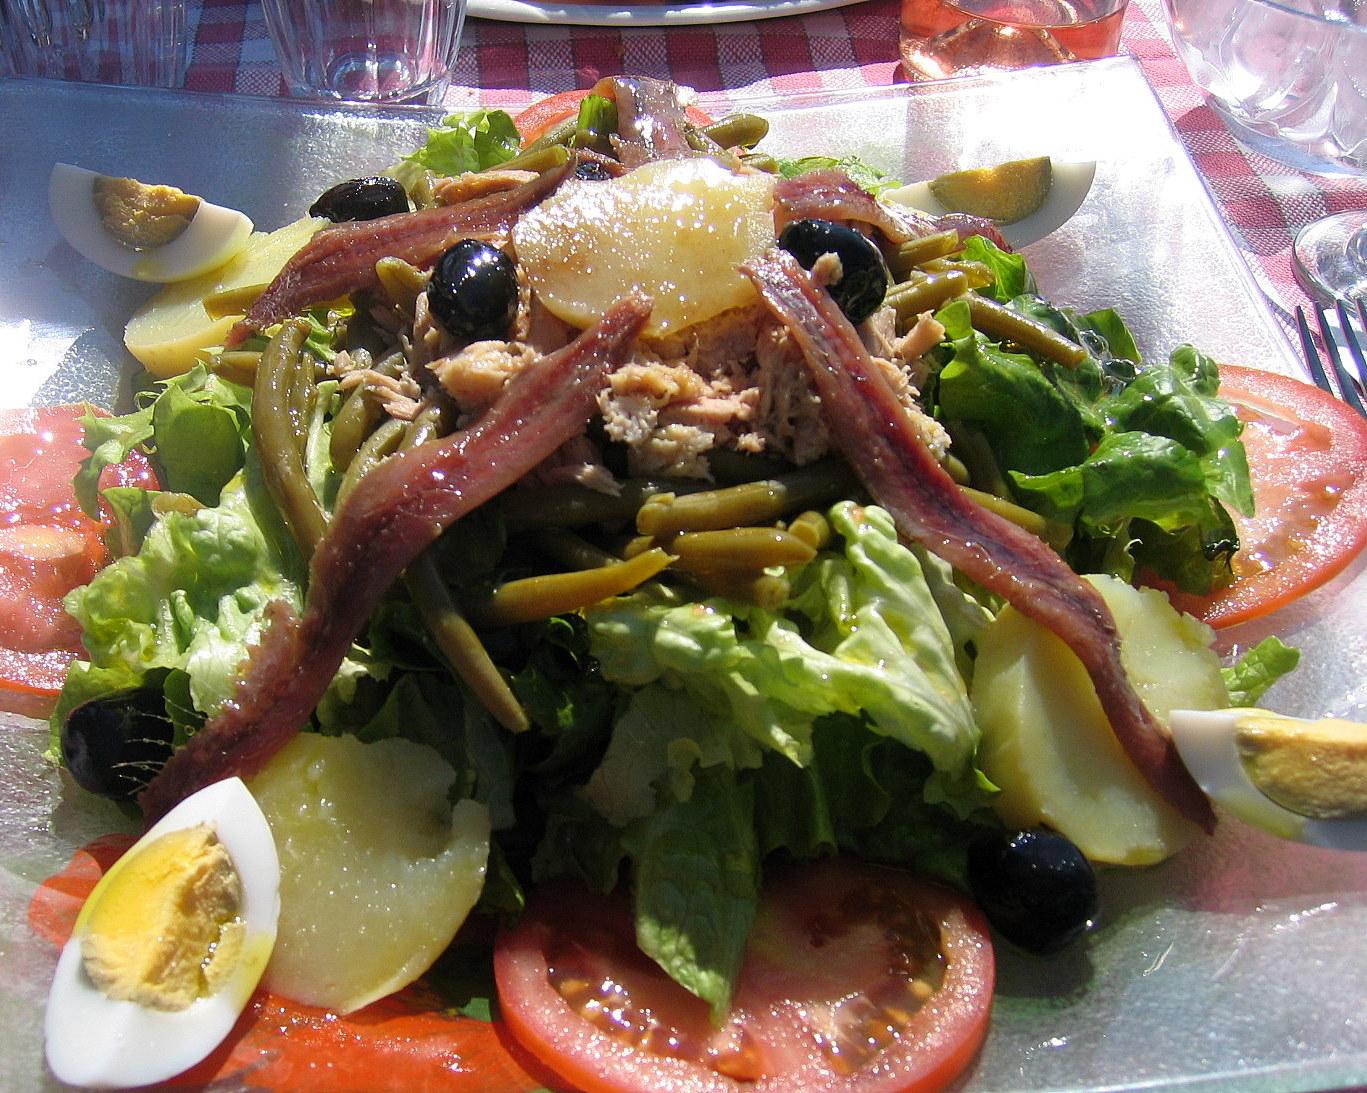 Nice cooking la cuisine ni oise for Restaurant cuisine nicoise nice